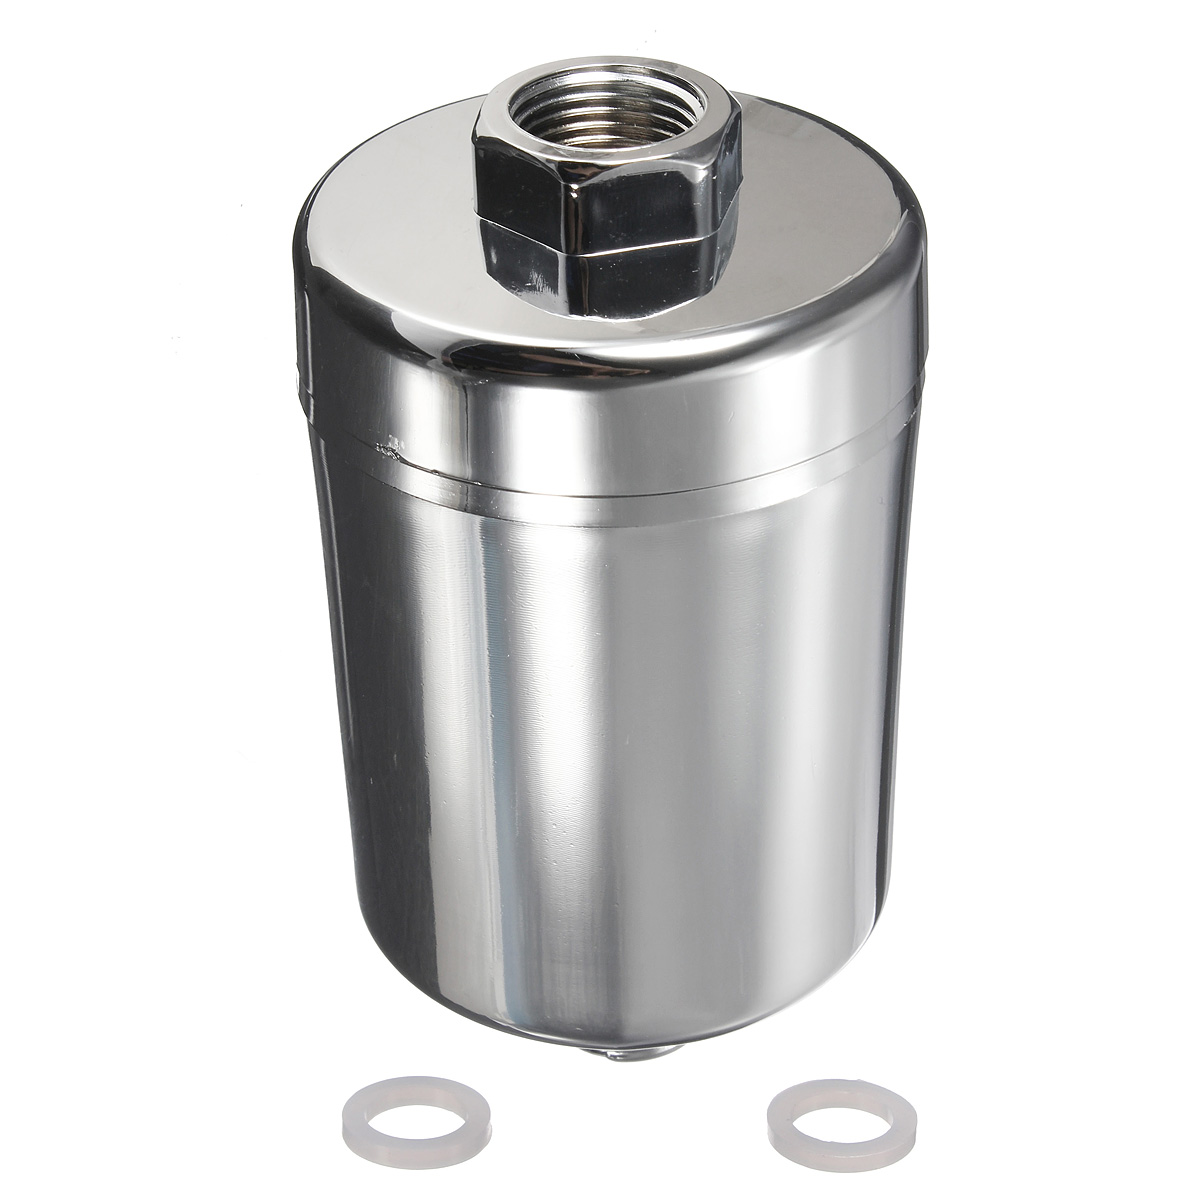 Softener Remove Inline Shower Faucet Head Filter Chlorine Water Purifier Chrome Ebay